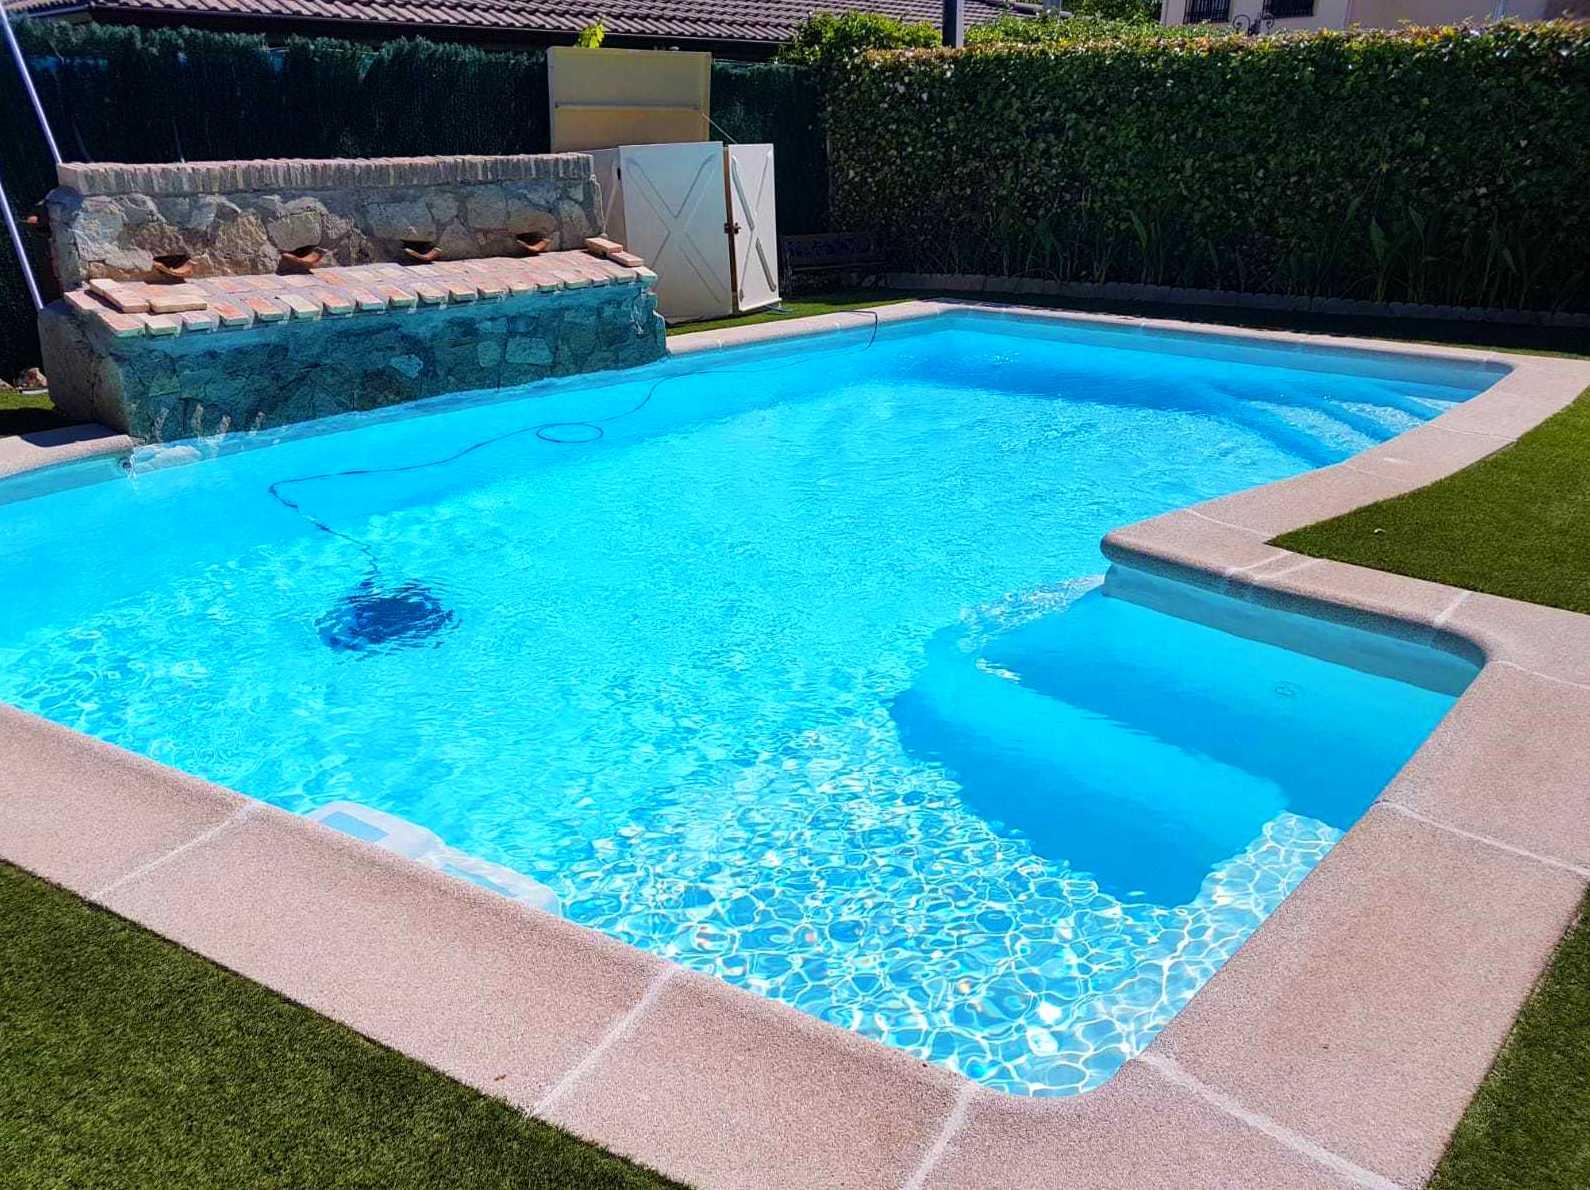 Foto 1 de Instalación de piscinas en Leganés | Lallana Pol